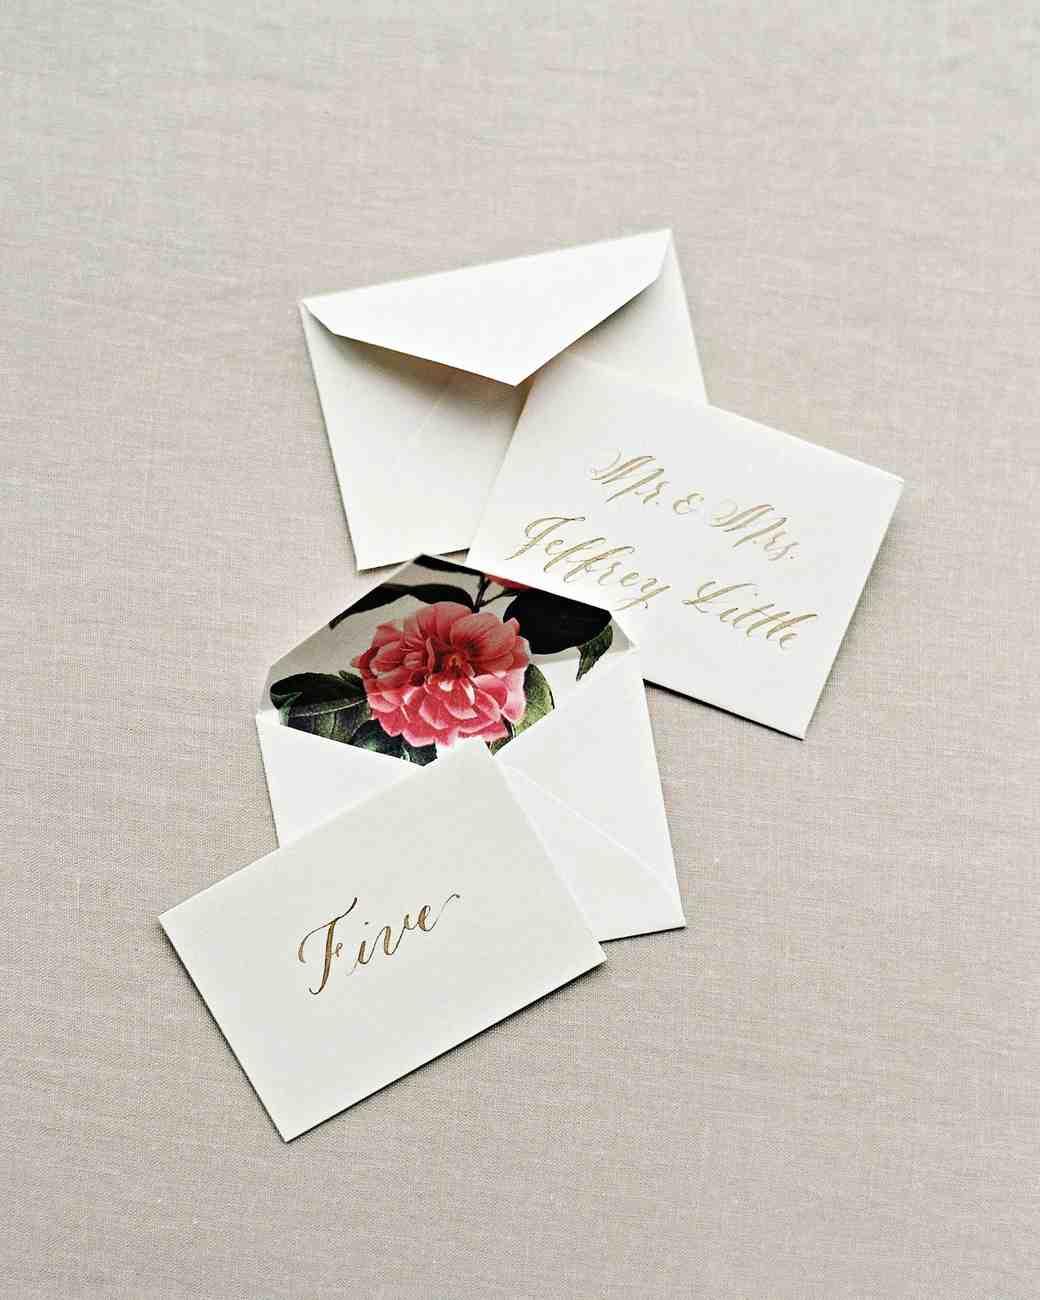 rebecca-david-wedding-new-york-escort-cards-d112241.jpg